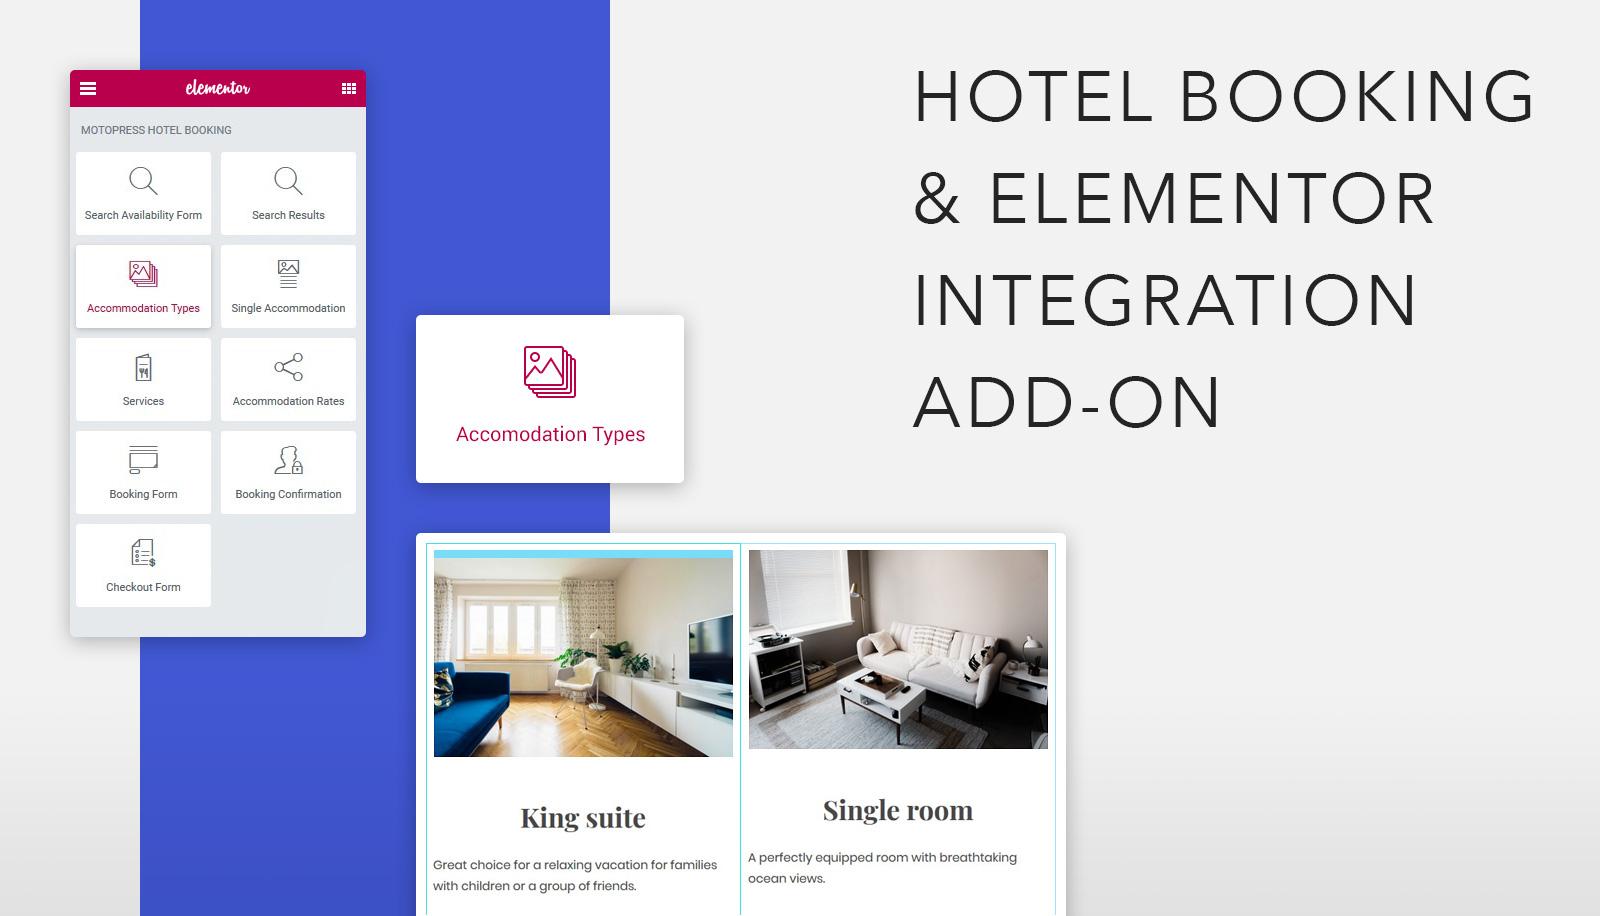 MotoPress Hotel Booking & Elementor Integration: Meet New Add-on